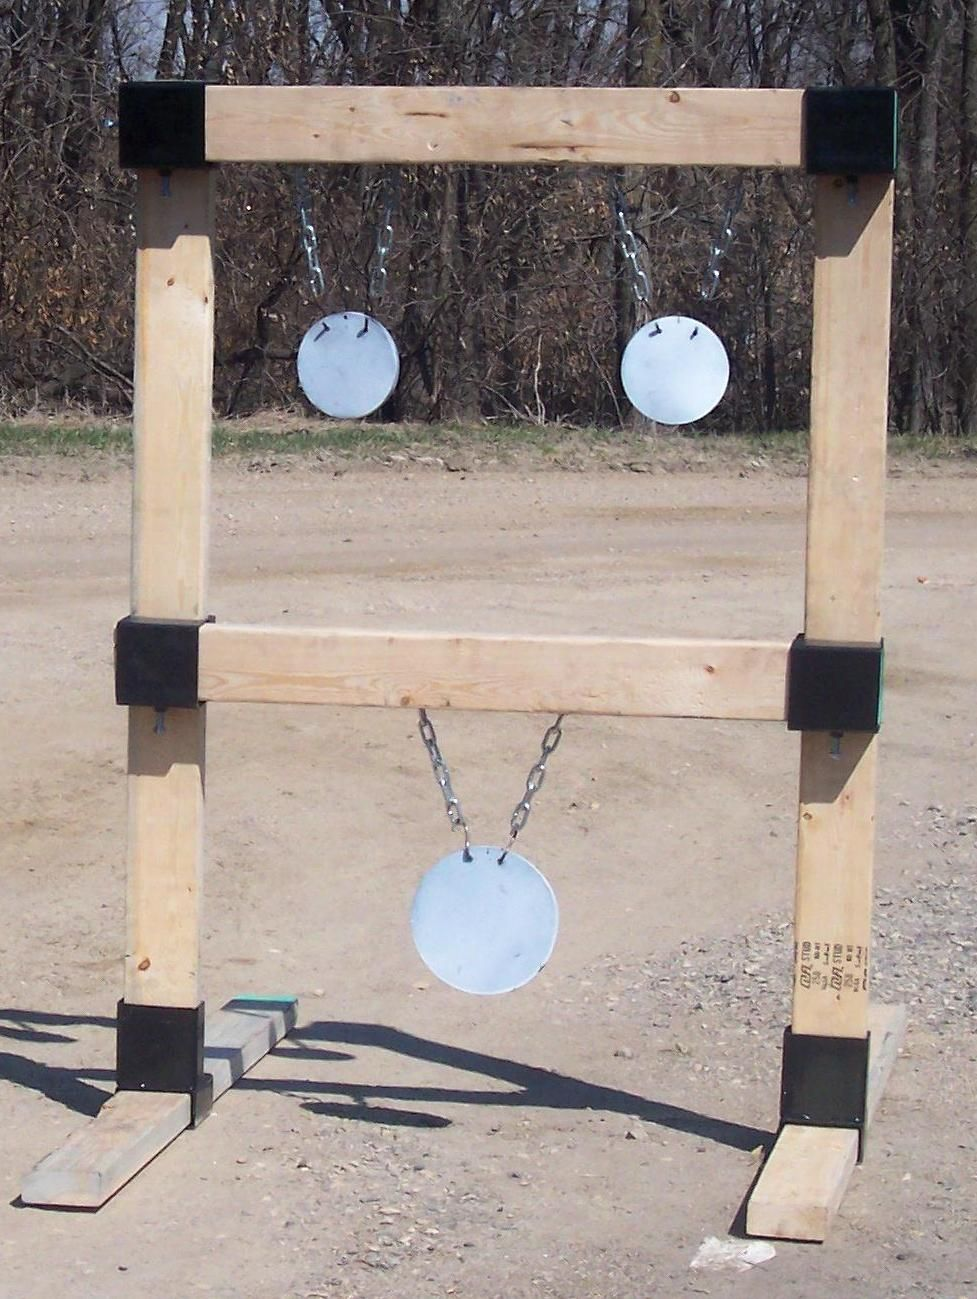 2x4 Hanging Target Stand Custom Steel Targets Plate